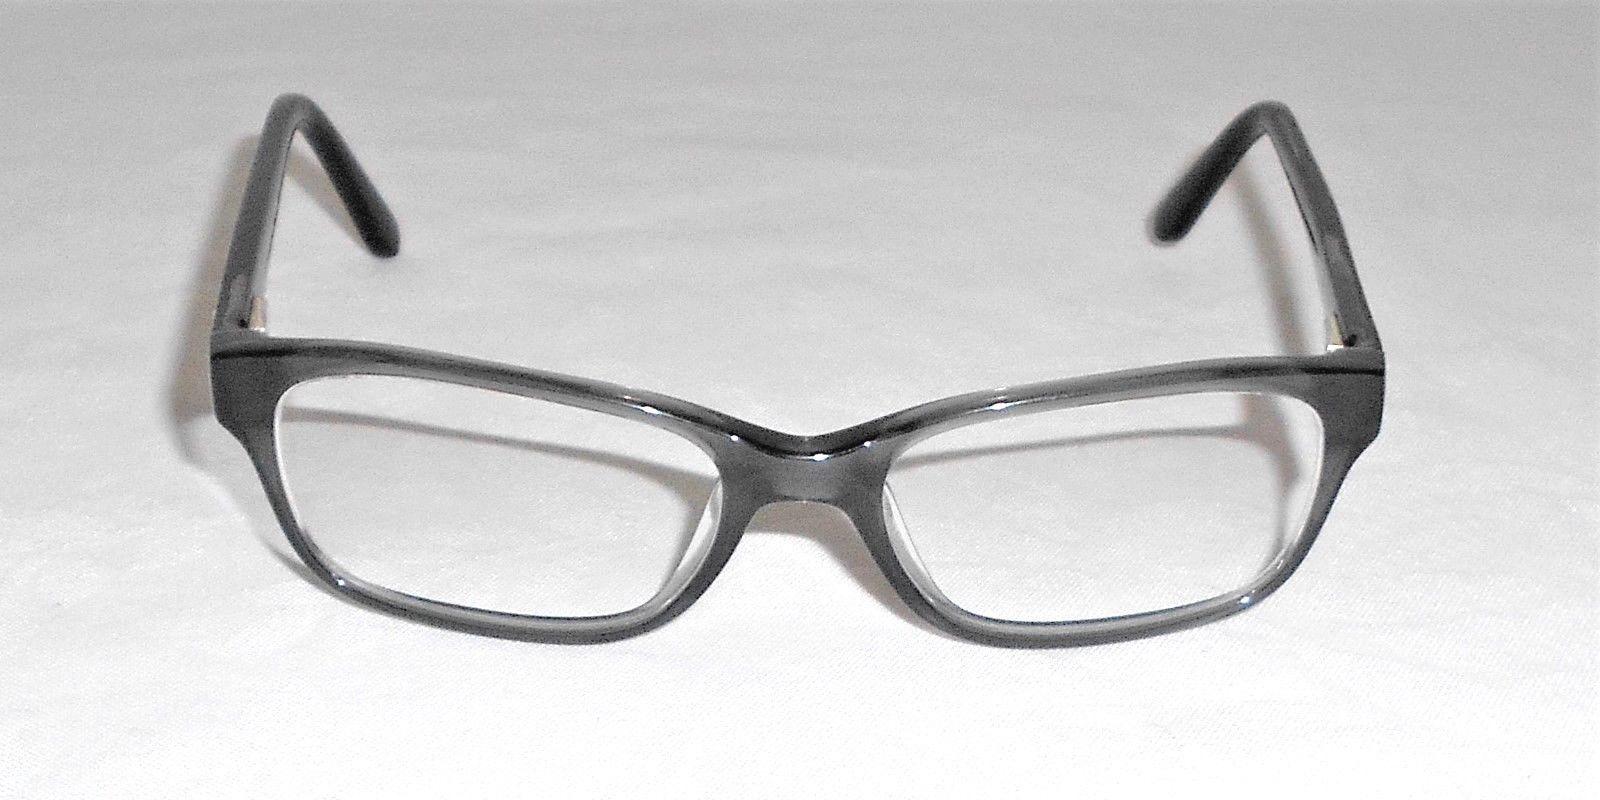 b13843f81fe Lacoste Youth Black Plastic L3806 Eyeglasses and 50 similar items